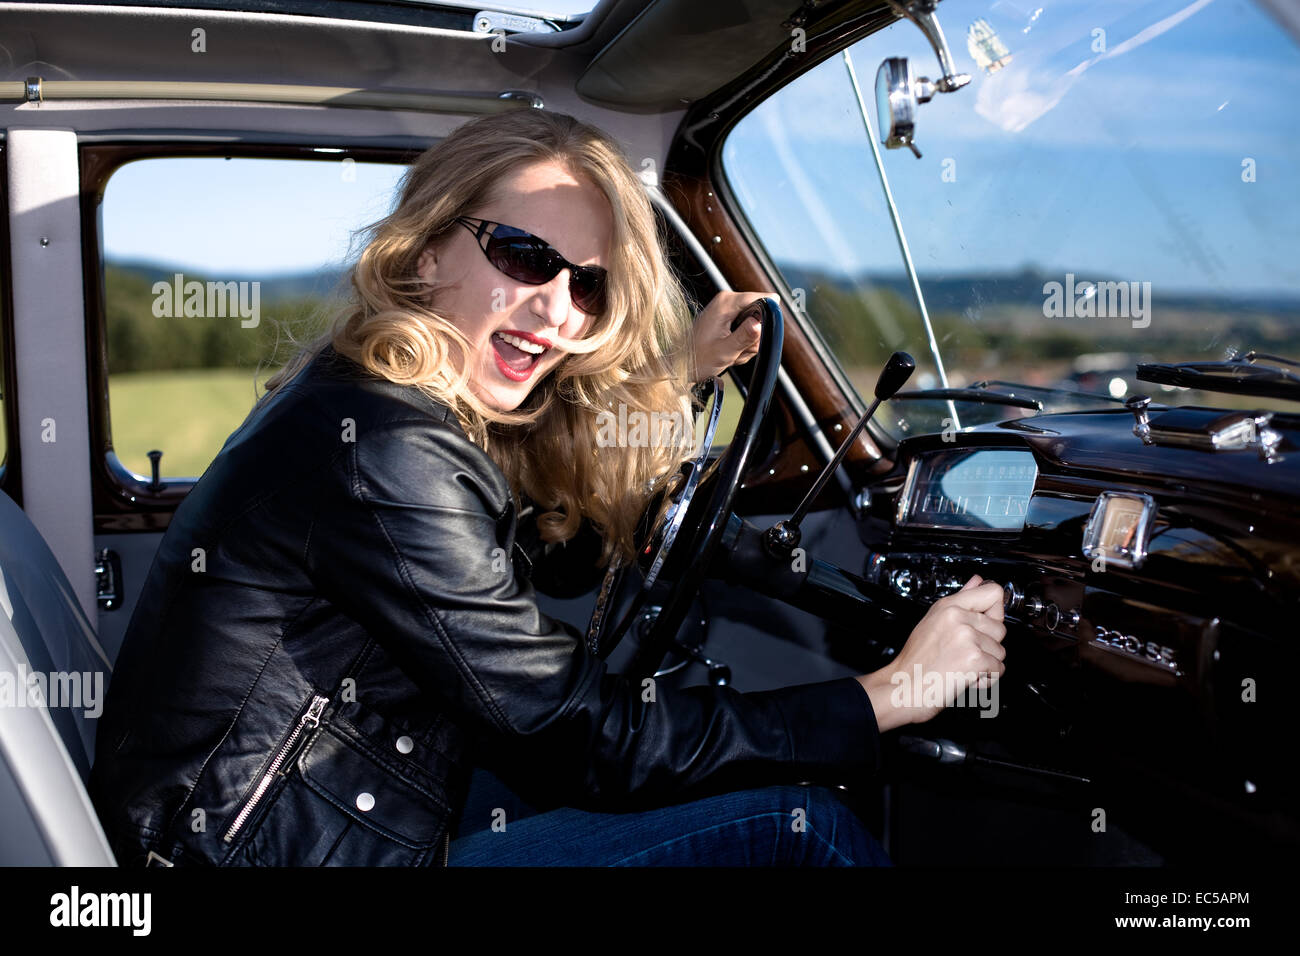 Girl inside of Post-War classic car - Stock Image